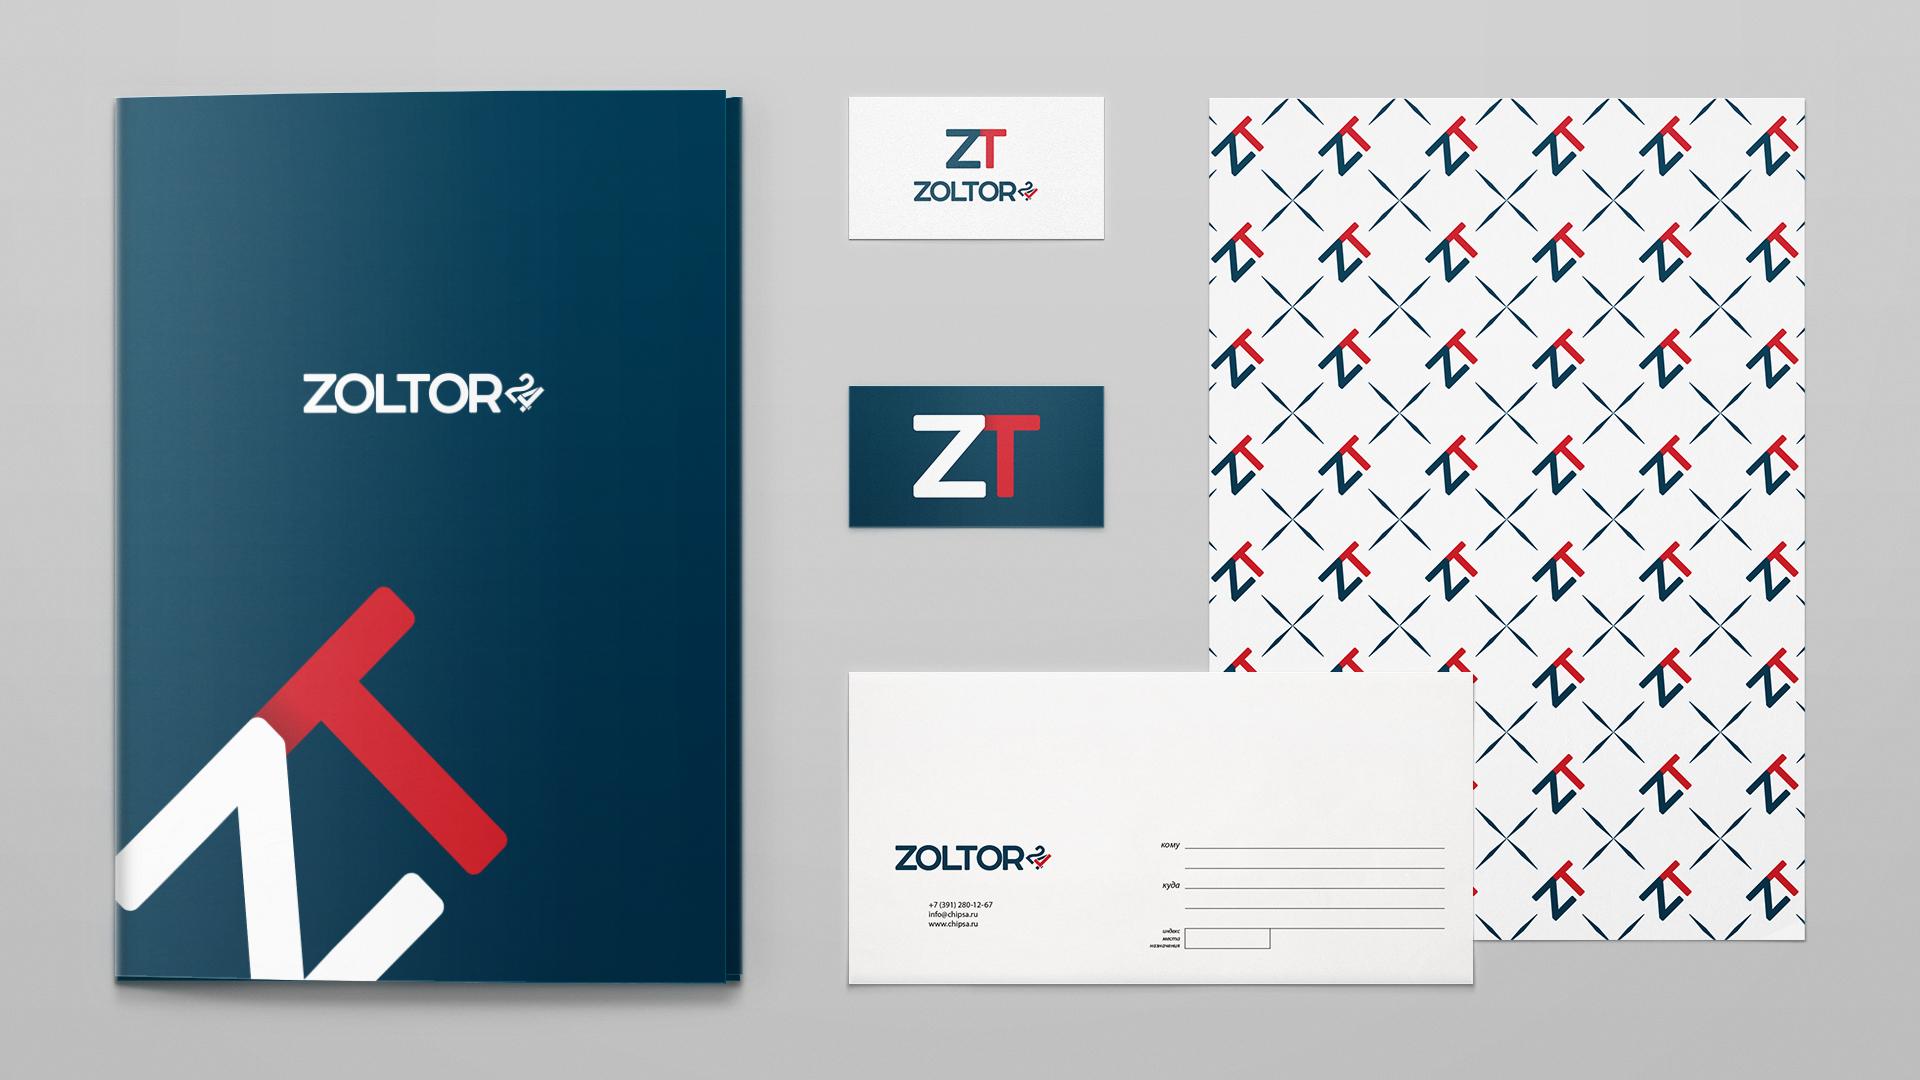 Логотип и фирменный стиль ZolTor24 фото f_2635c94e04d80554.jpg